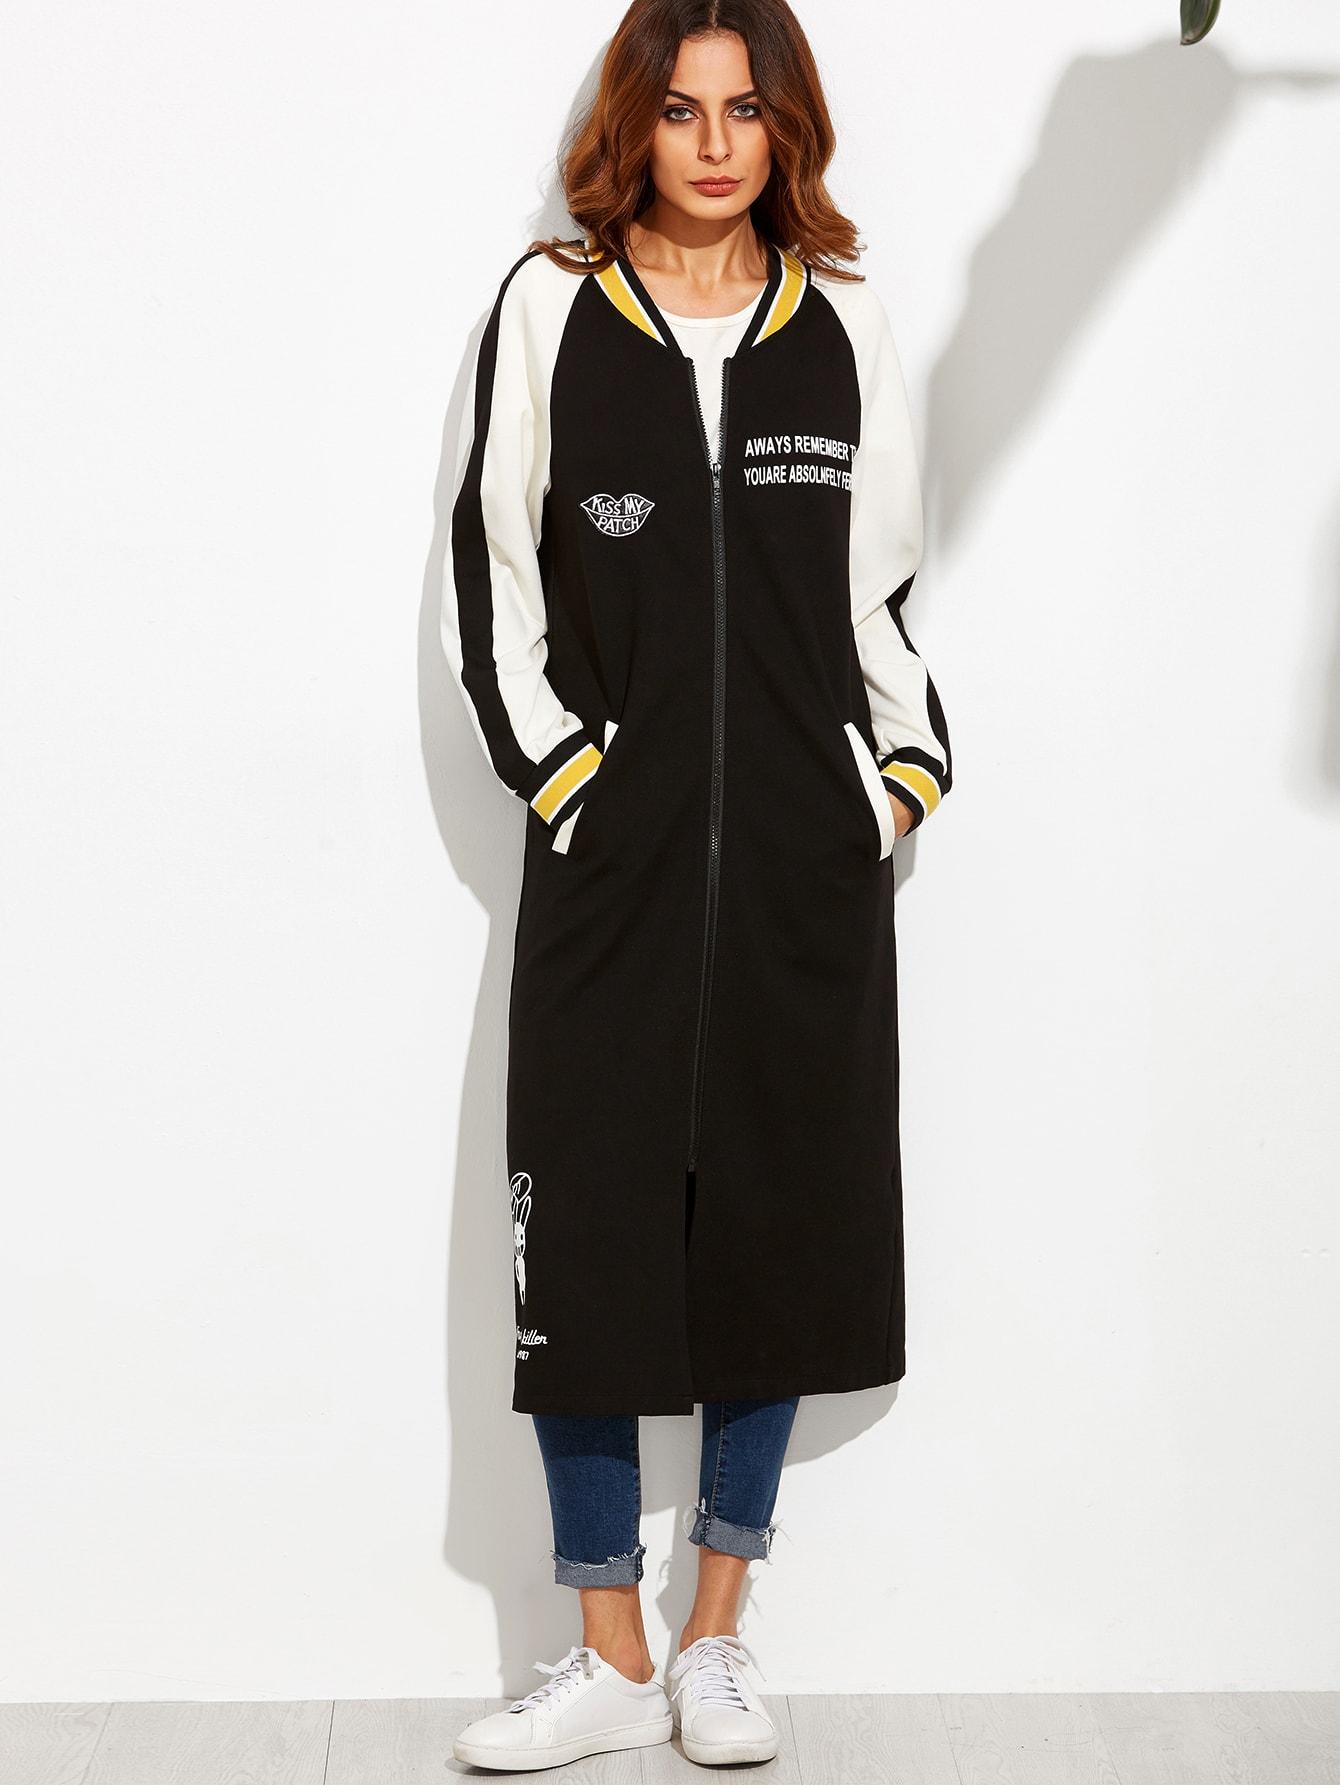 outerwear160810702_2